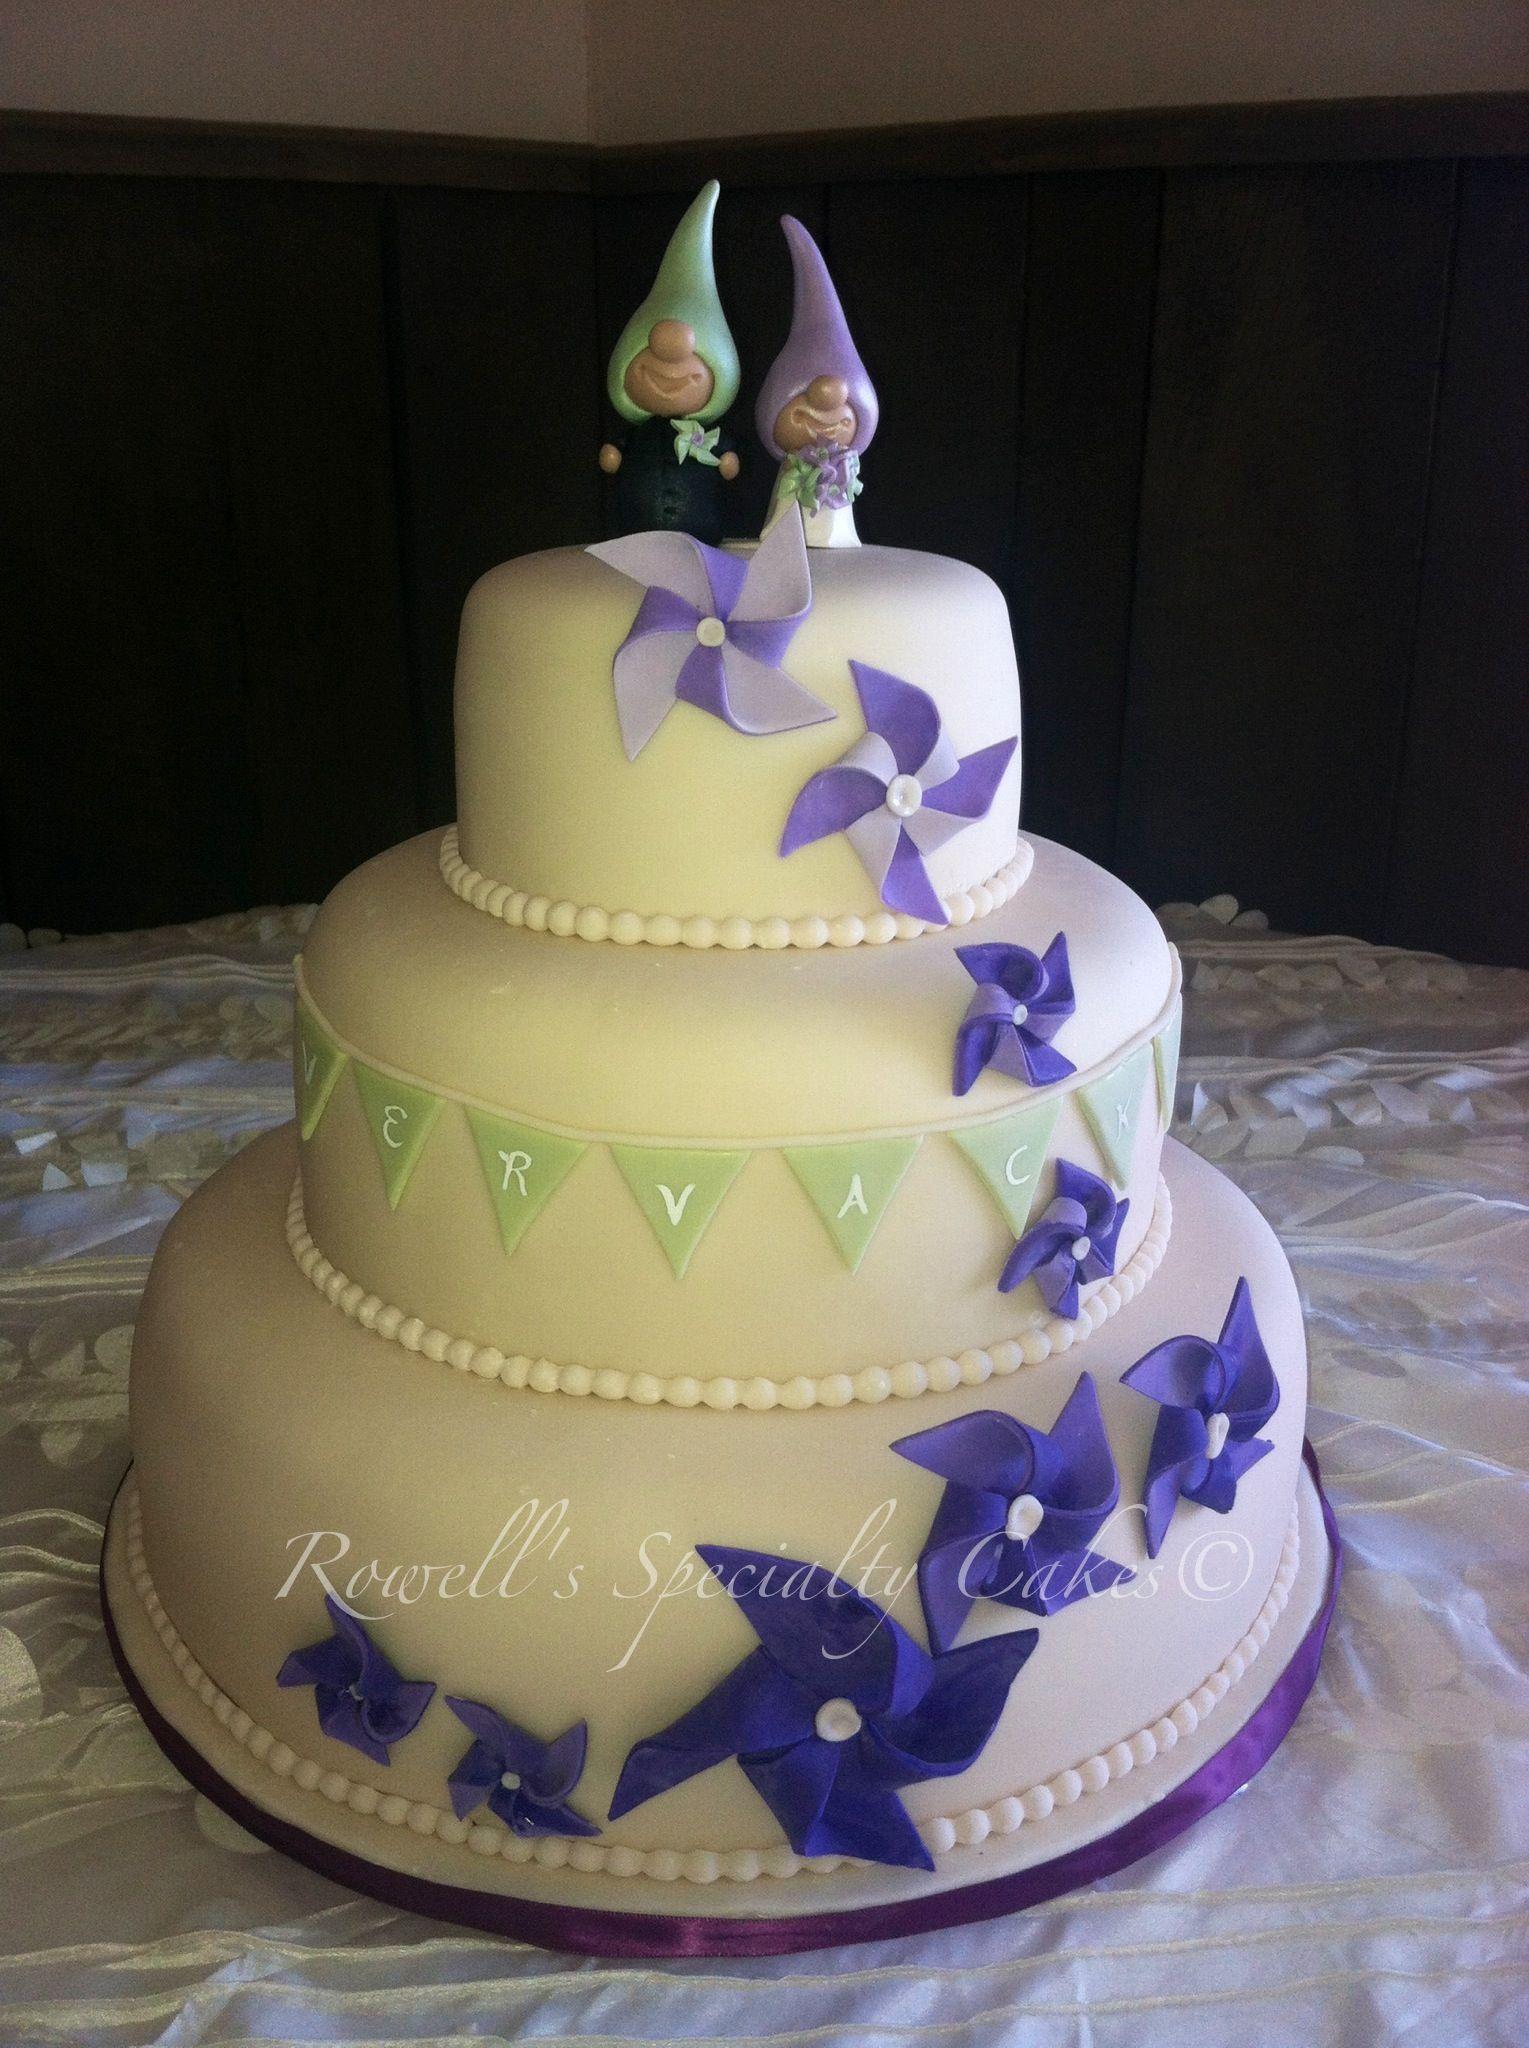 Rowell's specialty cakes, Purple wedding cakes, gnomes wedding cakes, pinwheels, banners, wedding cakes